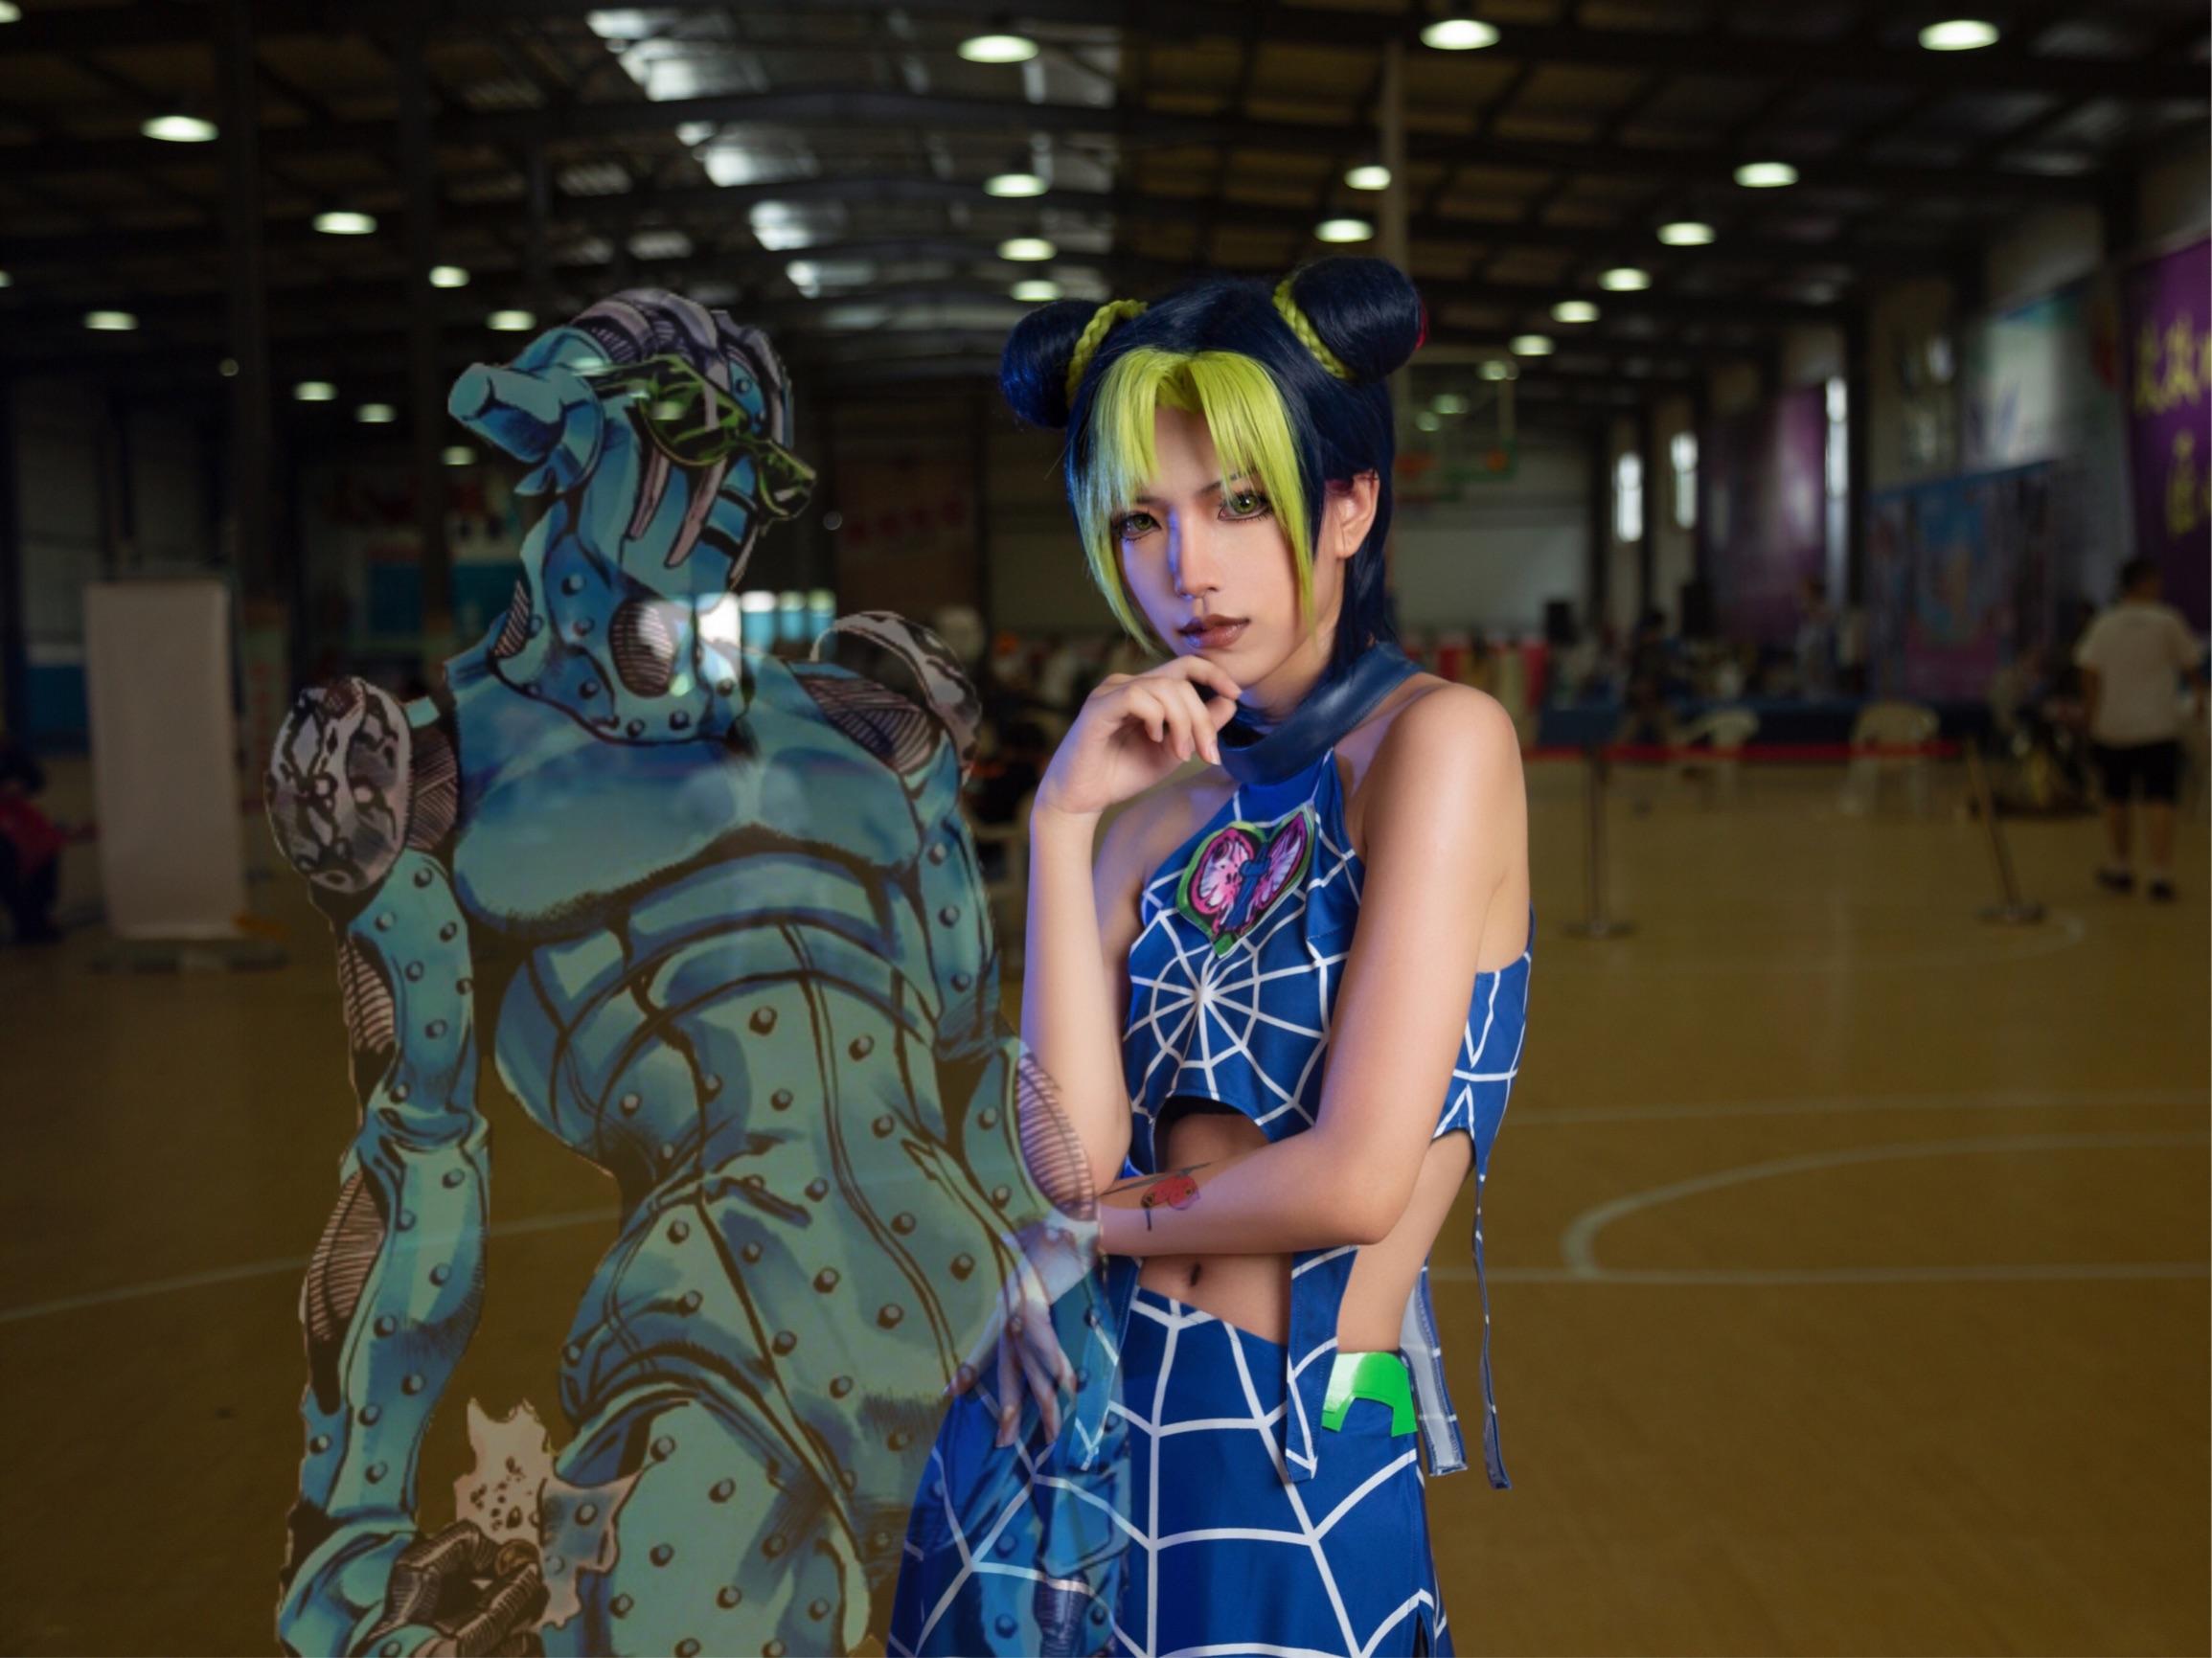 《JOJO的奇妙冒险》总结cosplay【CN:妙语连珠珠珠珠】-第5张